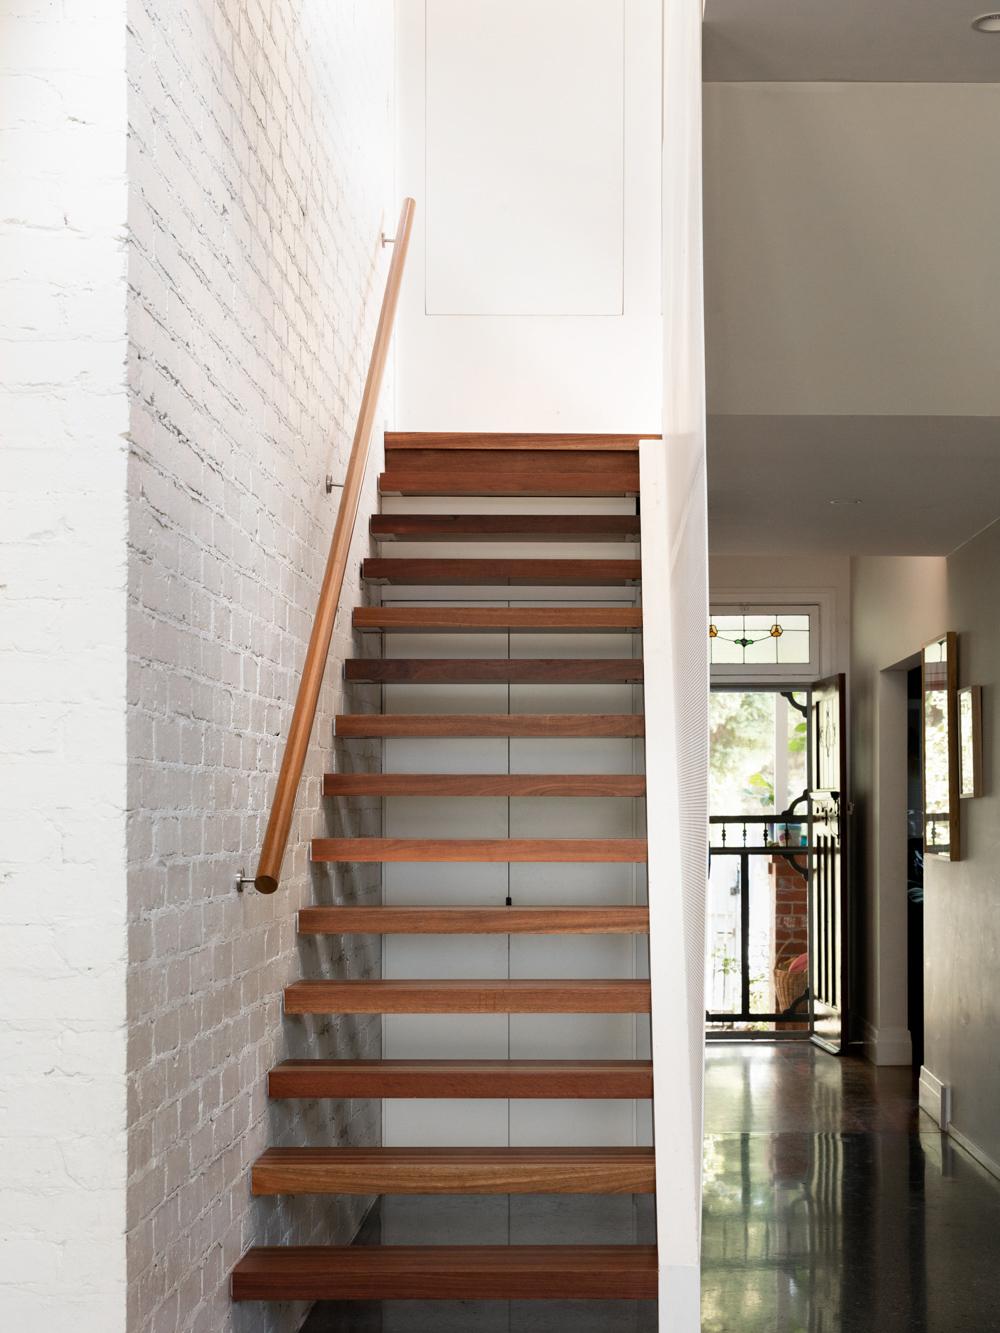 Timber stair design